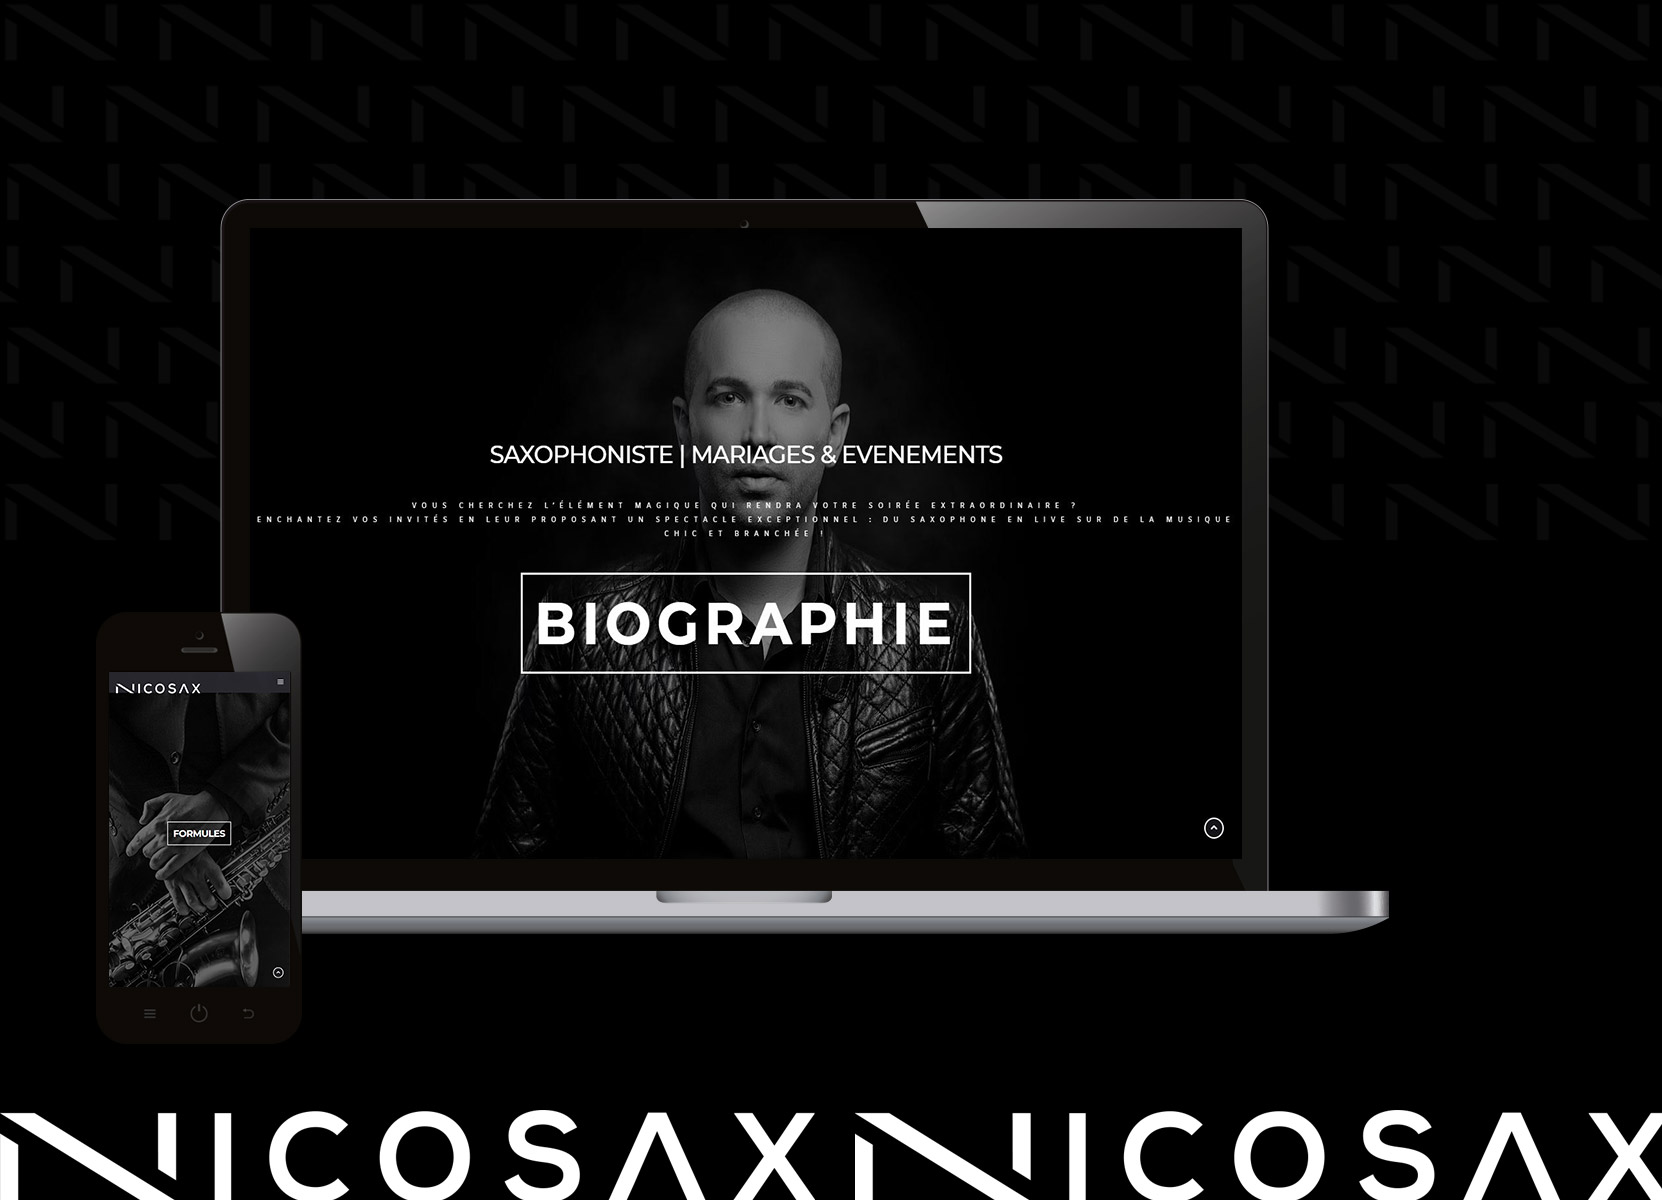 Nicosax présentation site 5